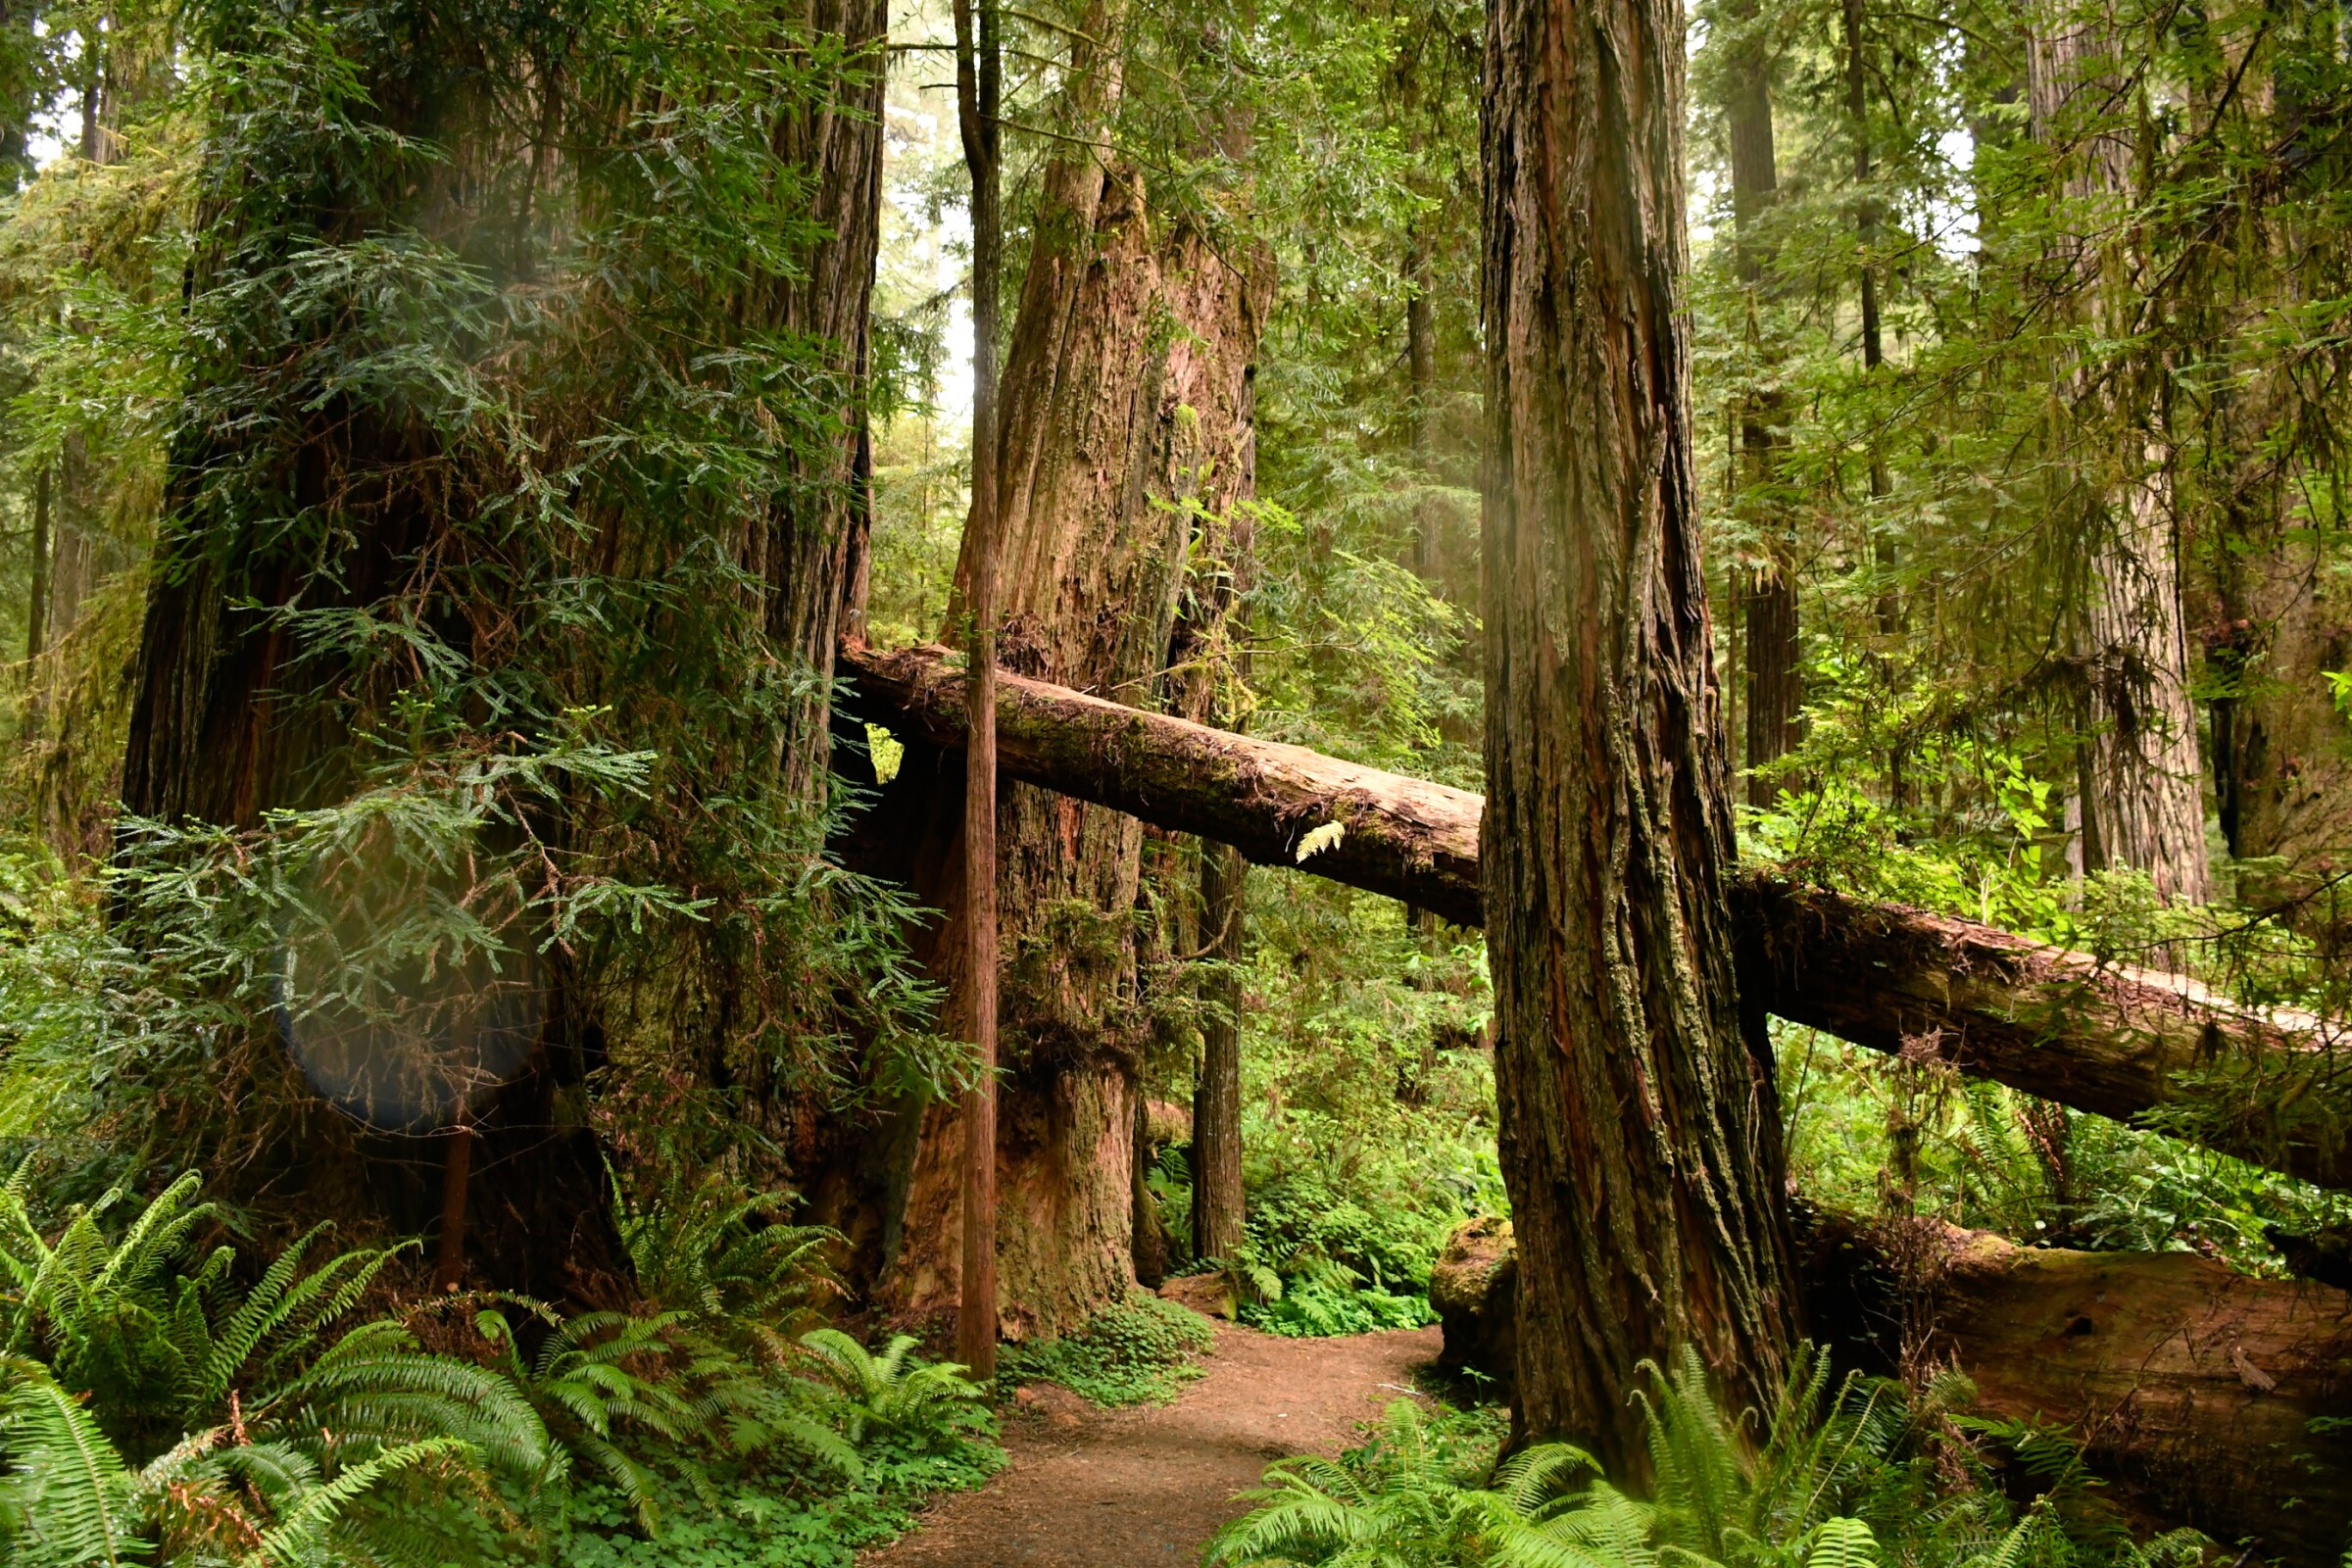 Prairie Creek Redwoods State Park in Humboldt County